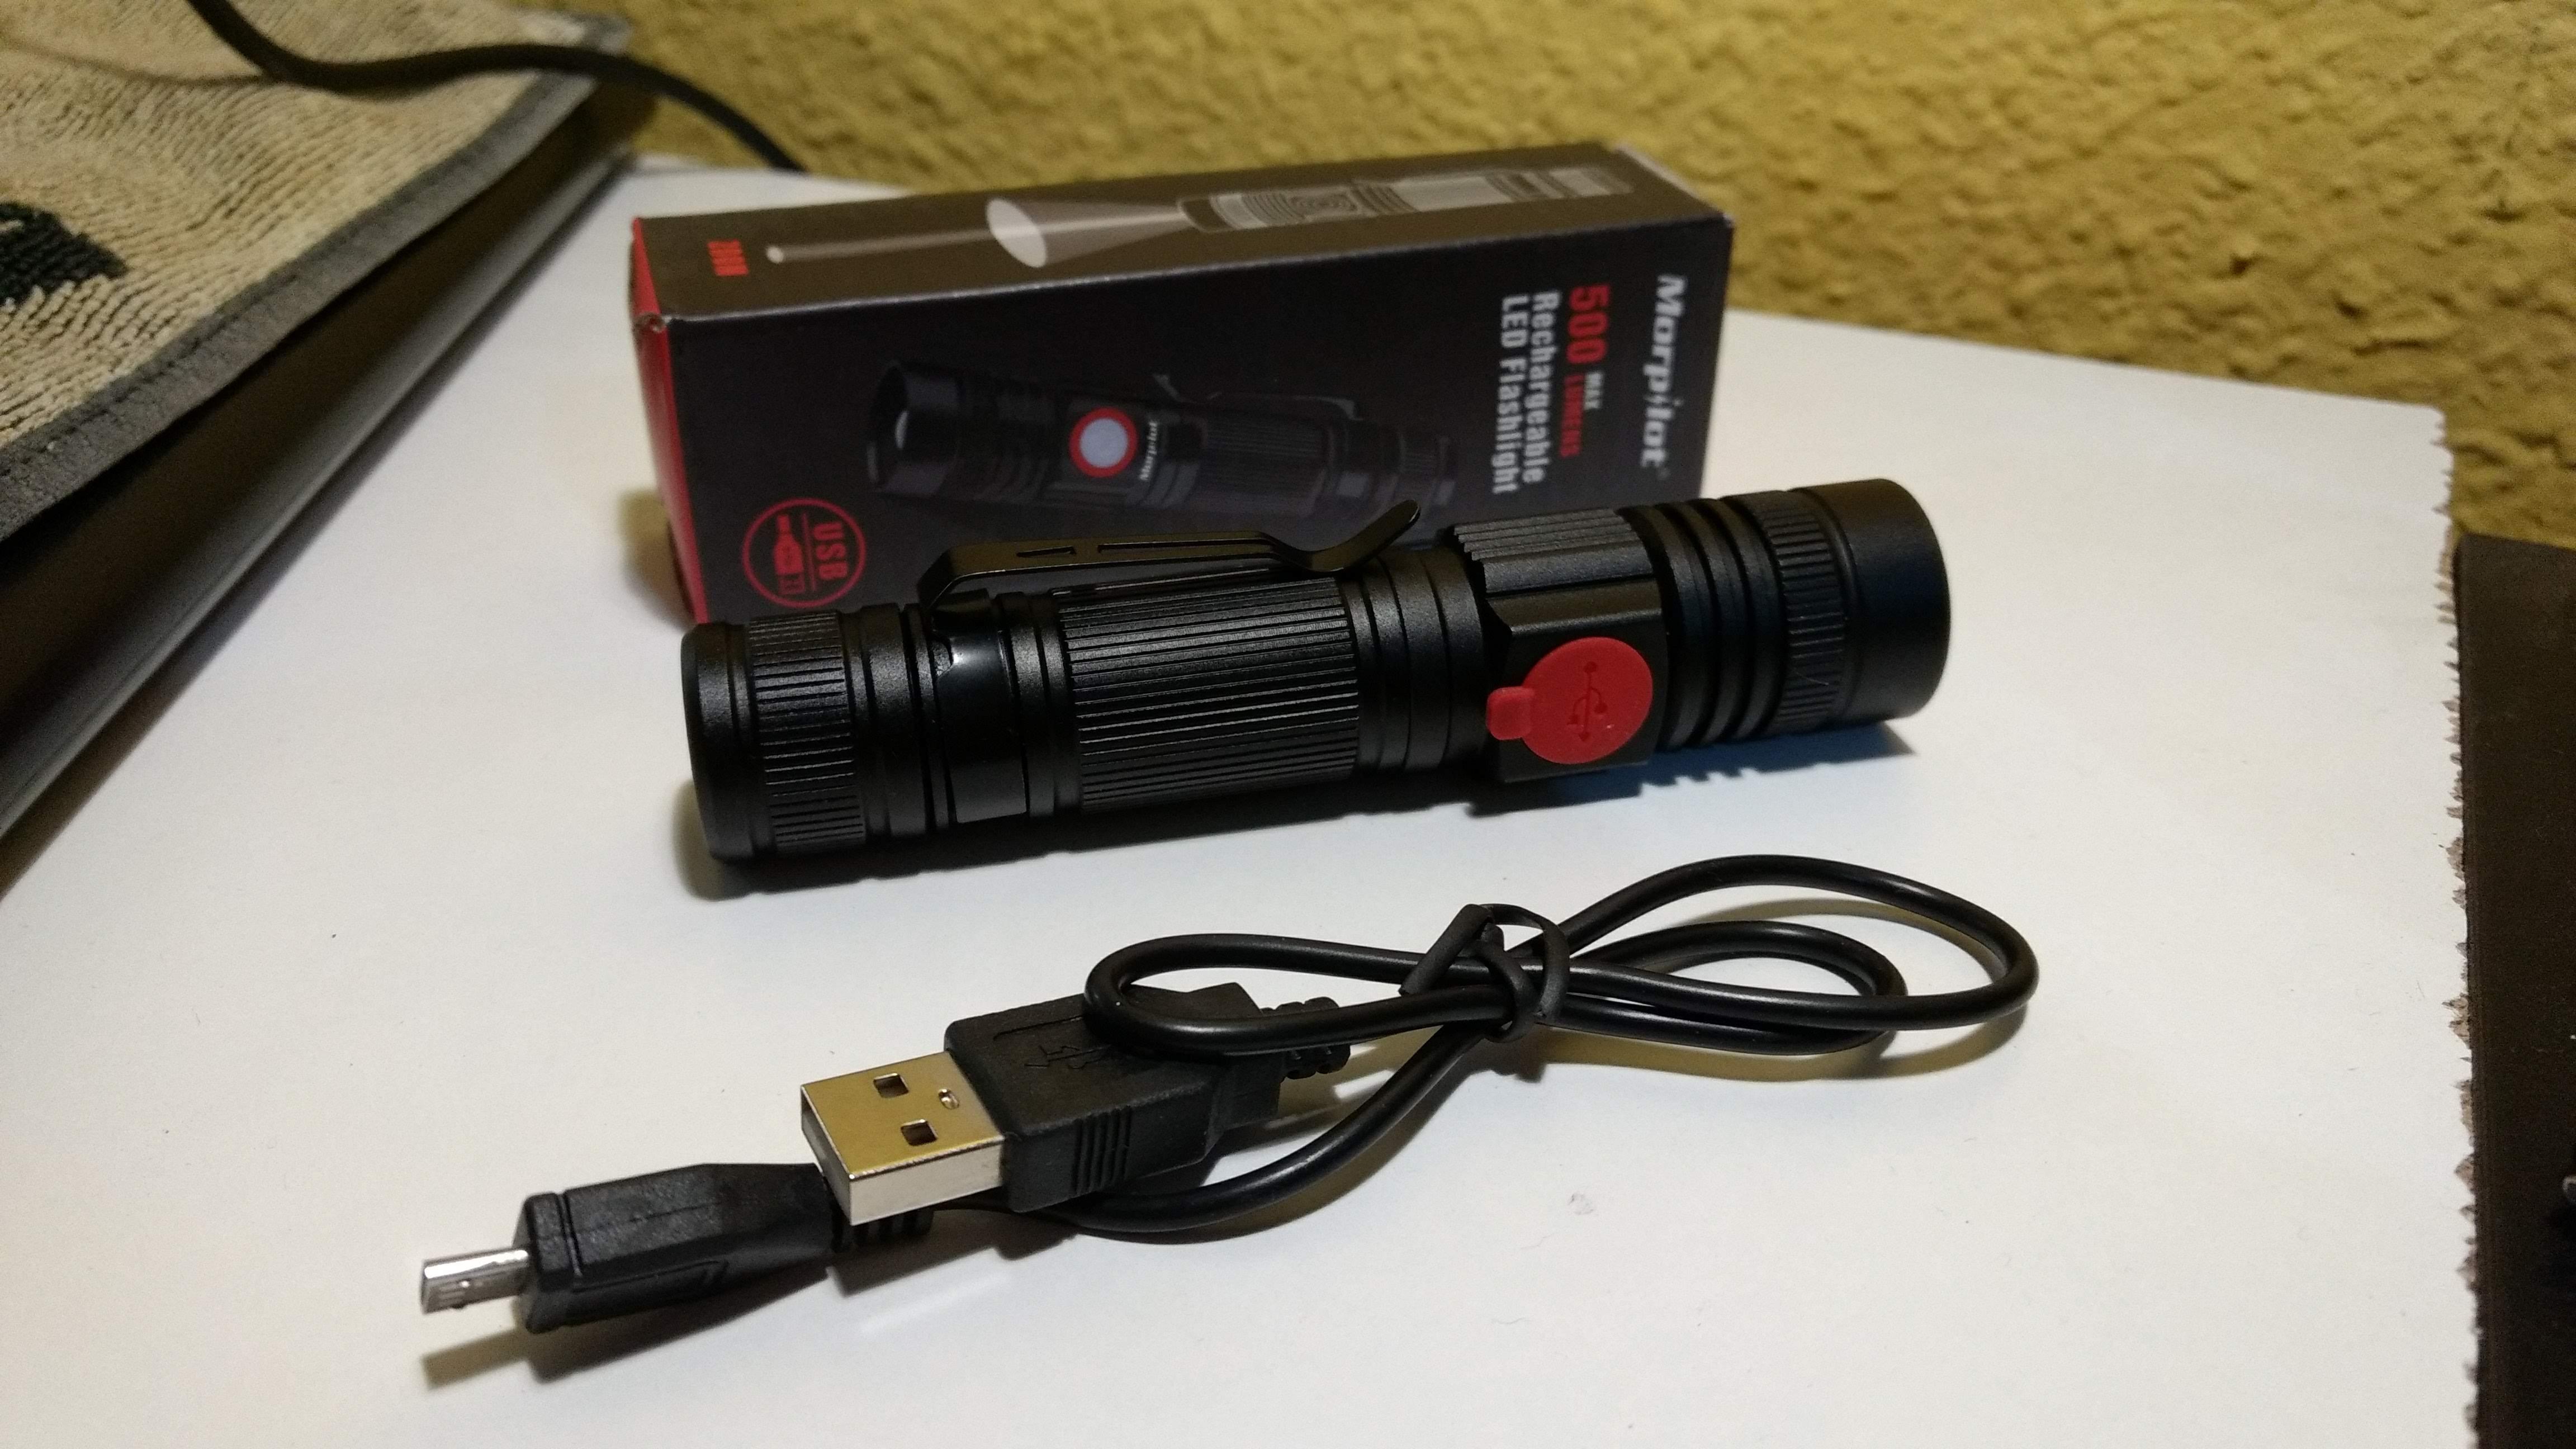 LINTERNA USB MORPILOT - 5 MODOS DE LUZ